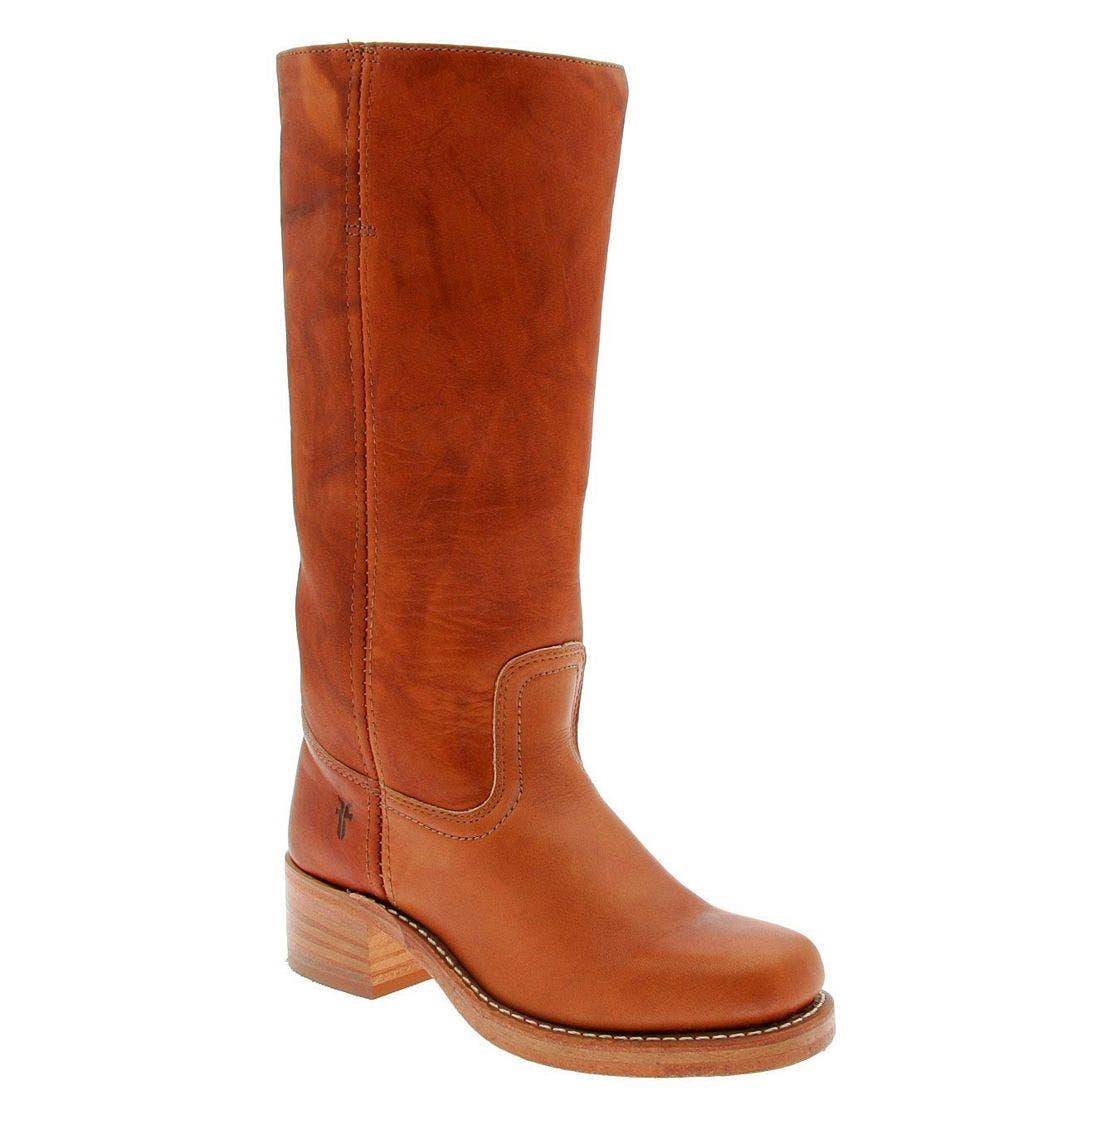 Alternate Image 1 Selected - Frye 'Campus 14L' Boot (Women)